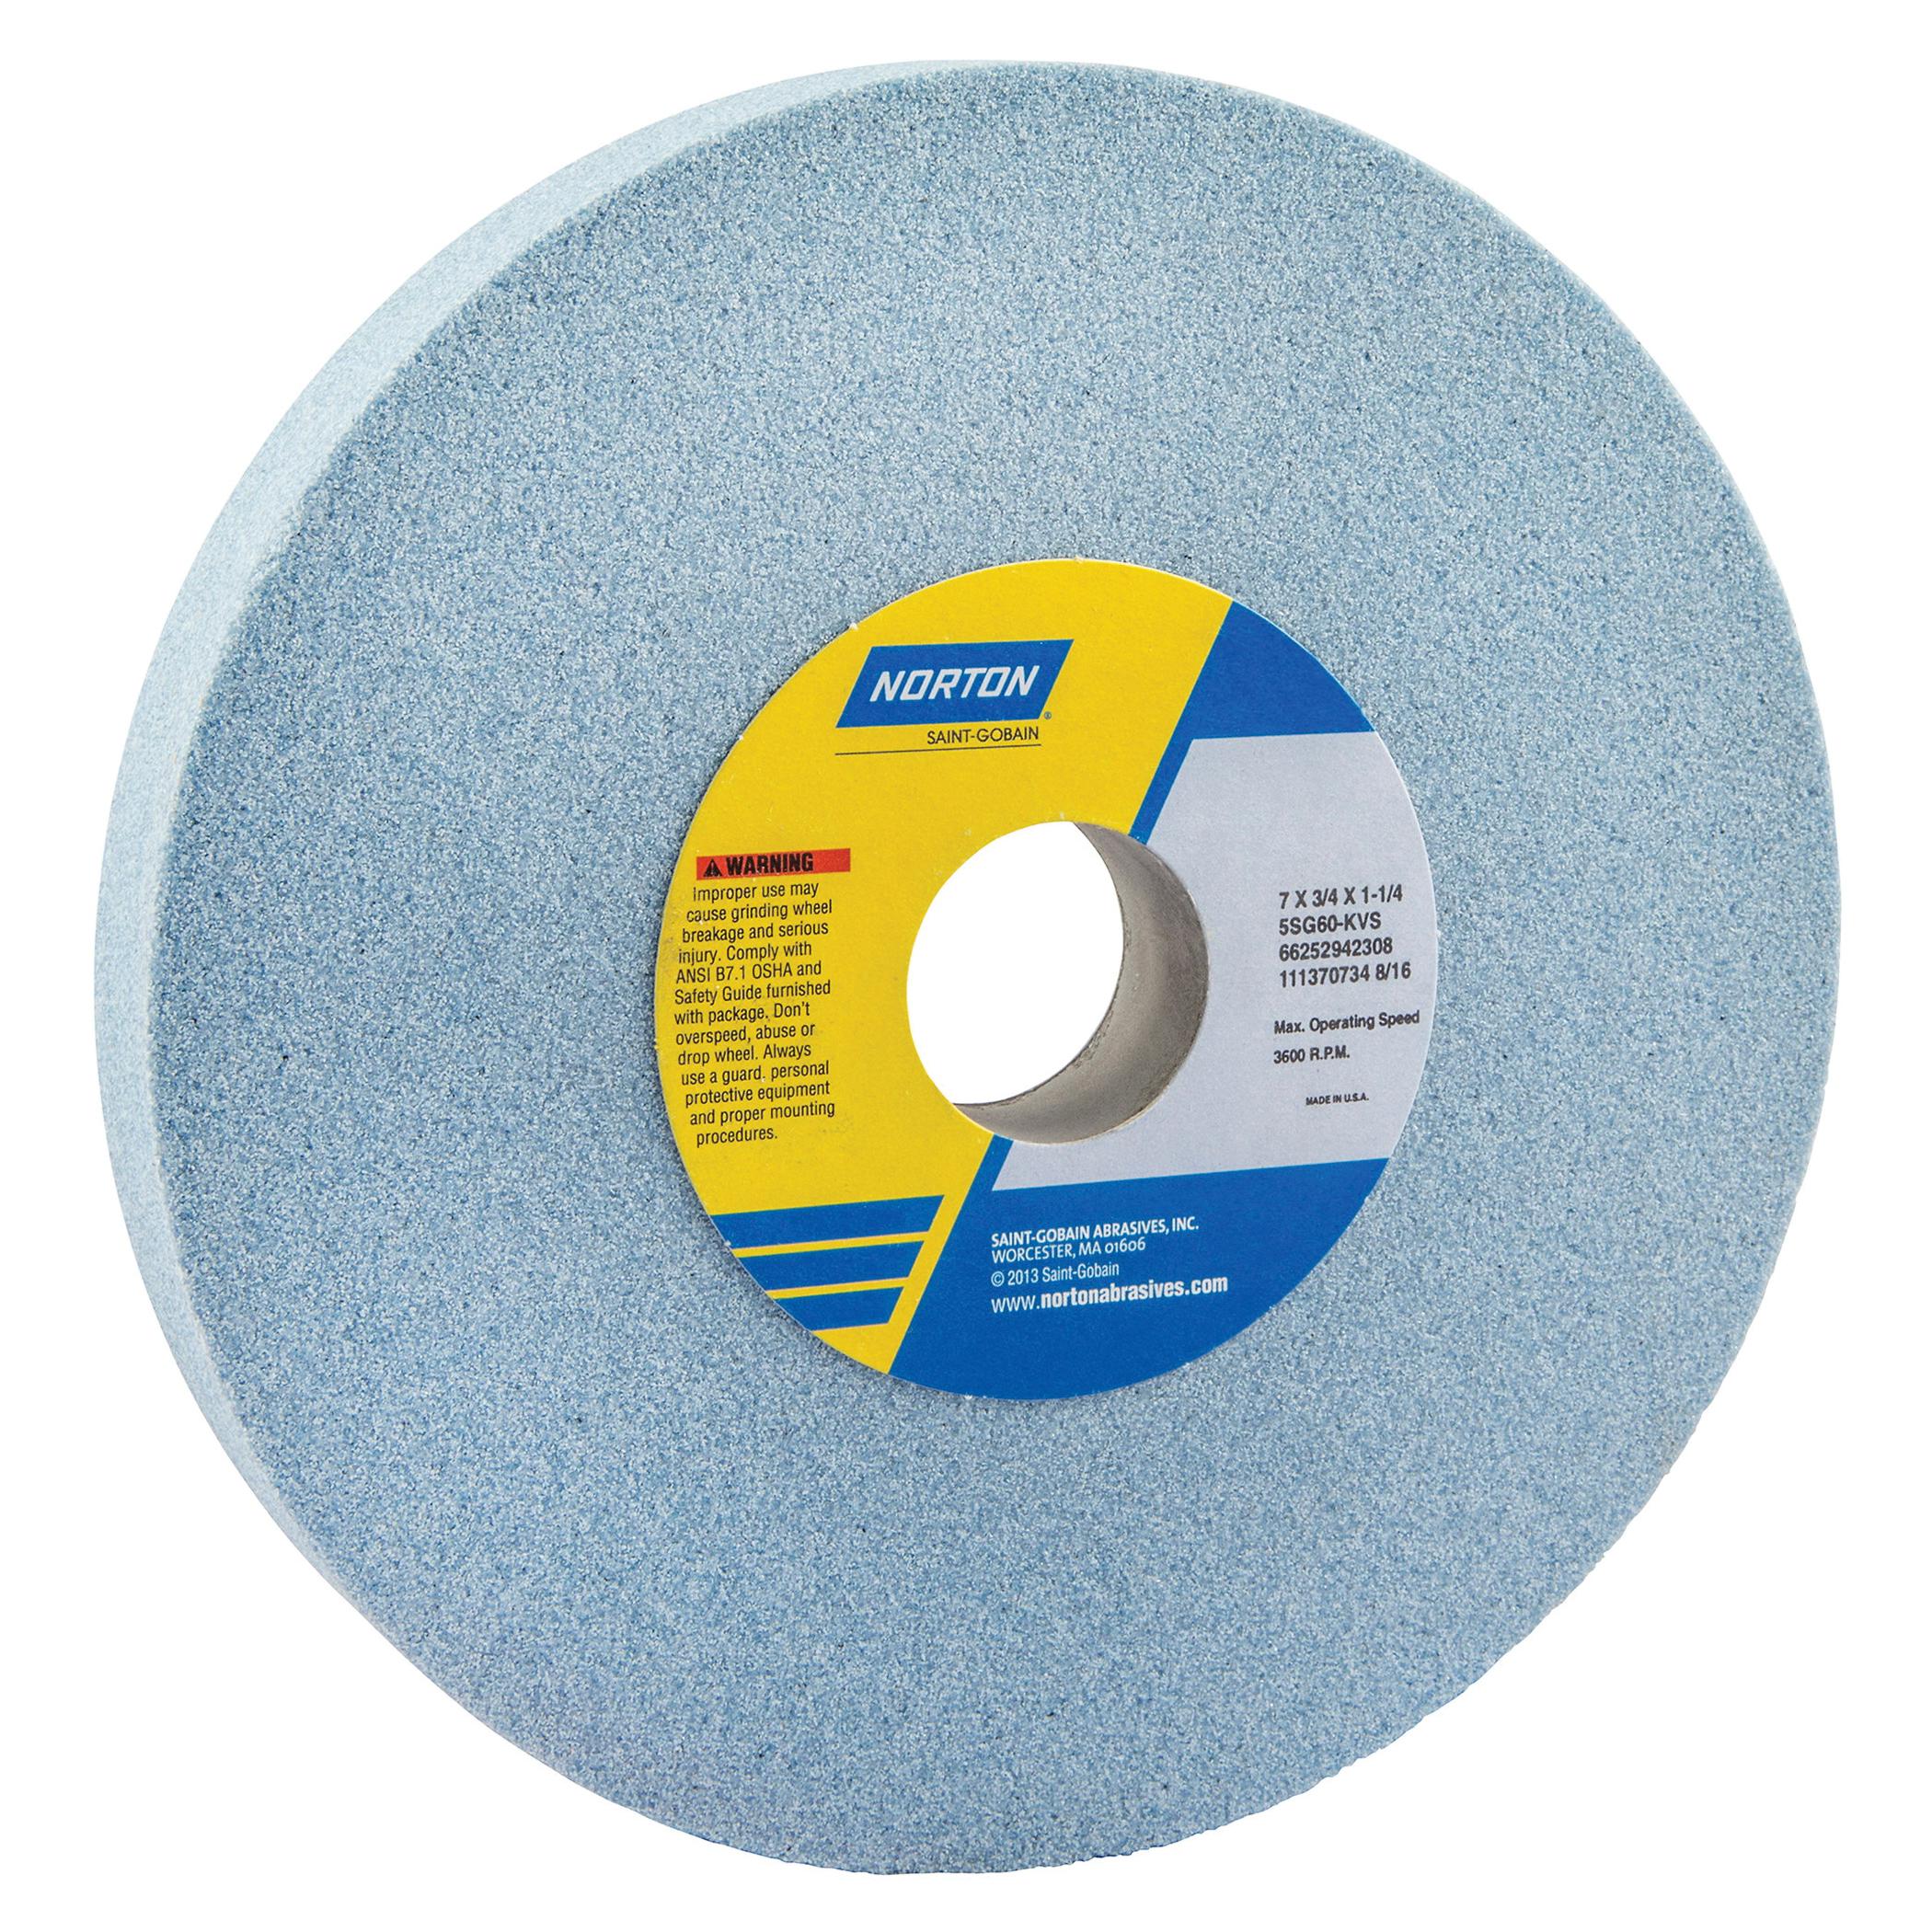 Norton® 66252942305 5SG Straight Toolroom Wheel, 7 in Dia x 3/4 in THK, 1-1/4 in Center Hole, 46 Grit, Ceramic Alumina/Friable Aluminum Oxide Abrasive